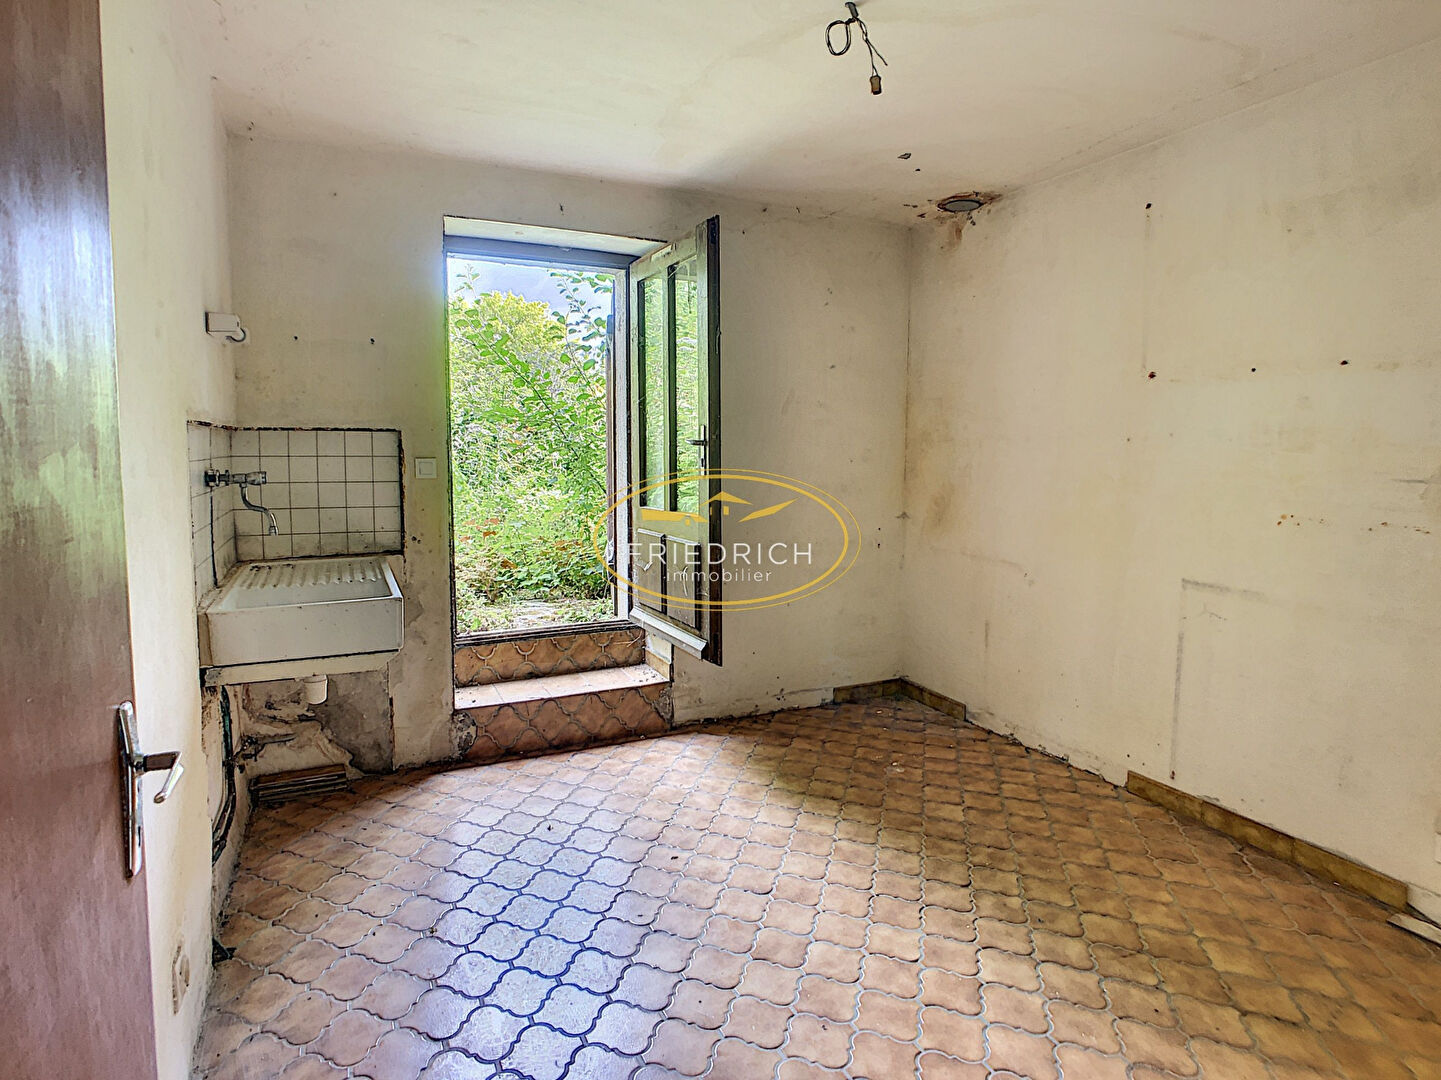 A vendre Maison SAMPIGNY 25.000